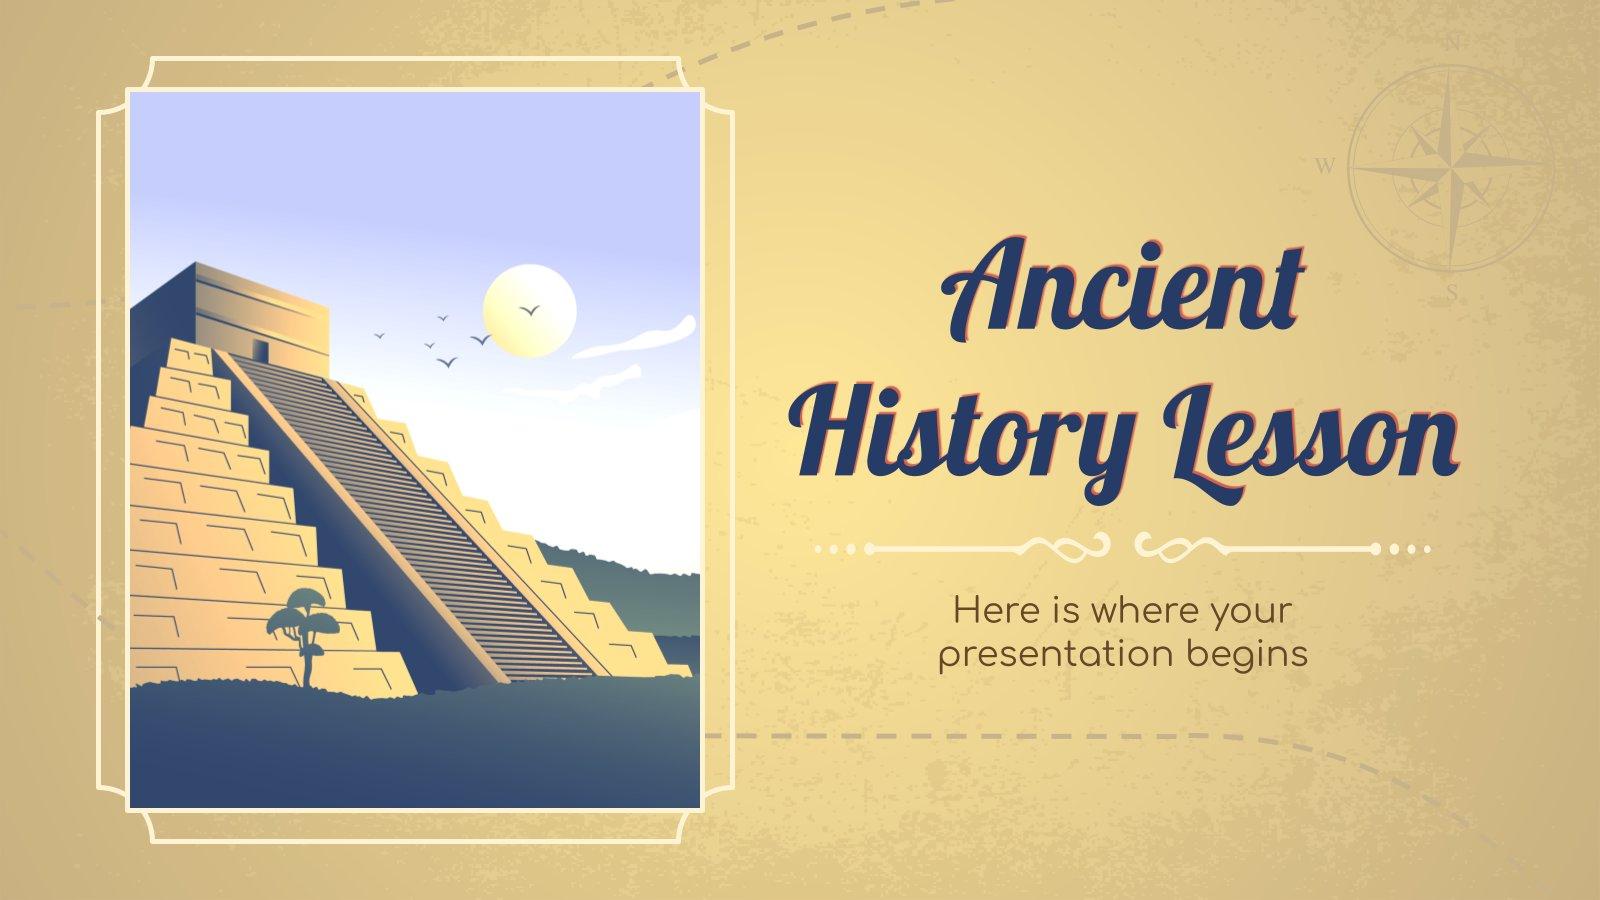 Plantilla de presentación Clase de historia antigua